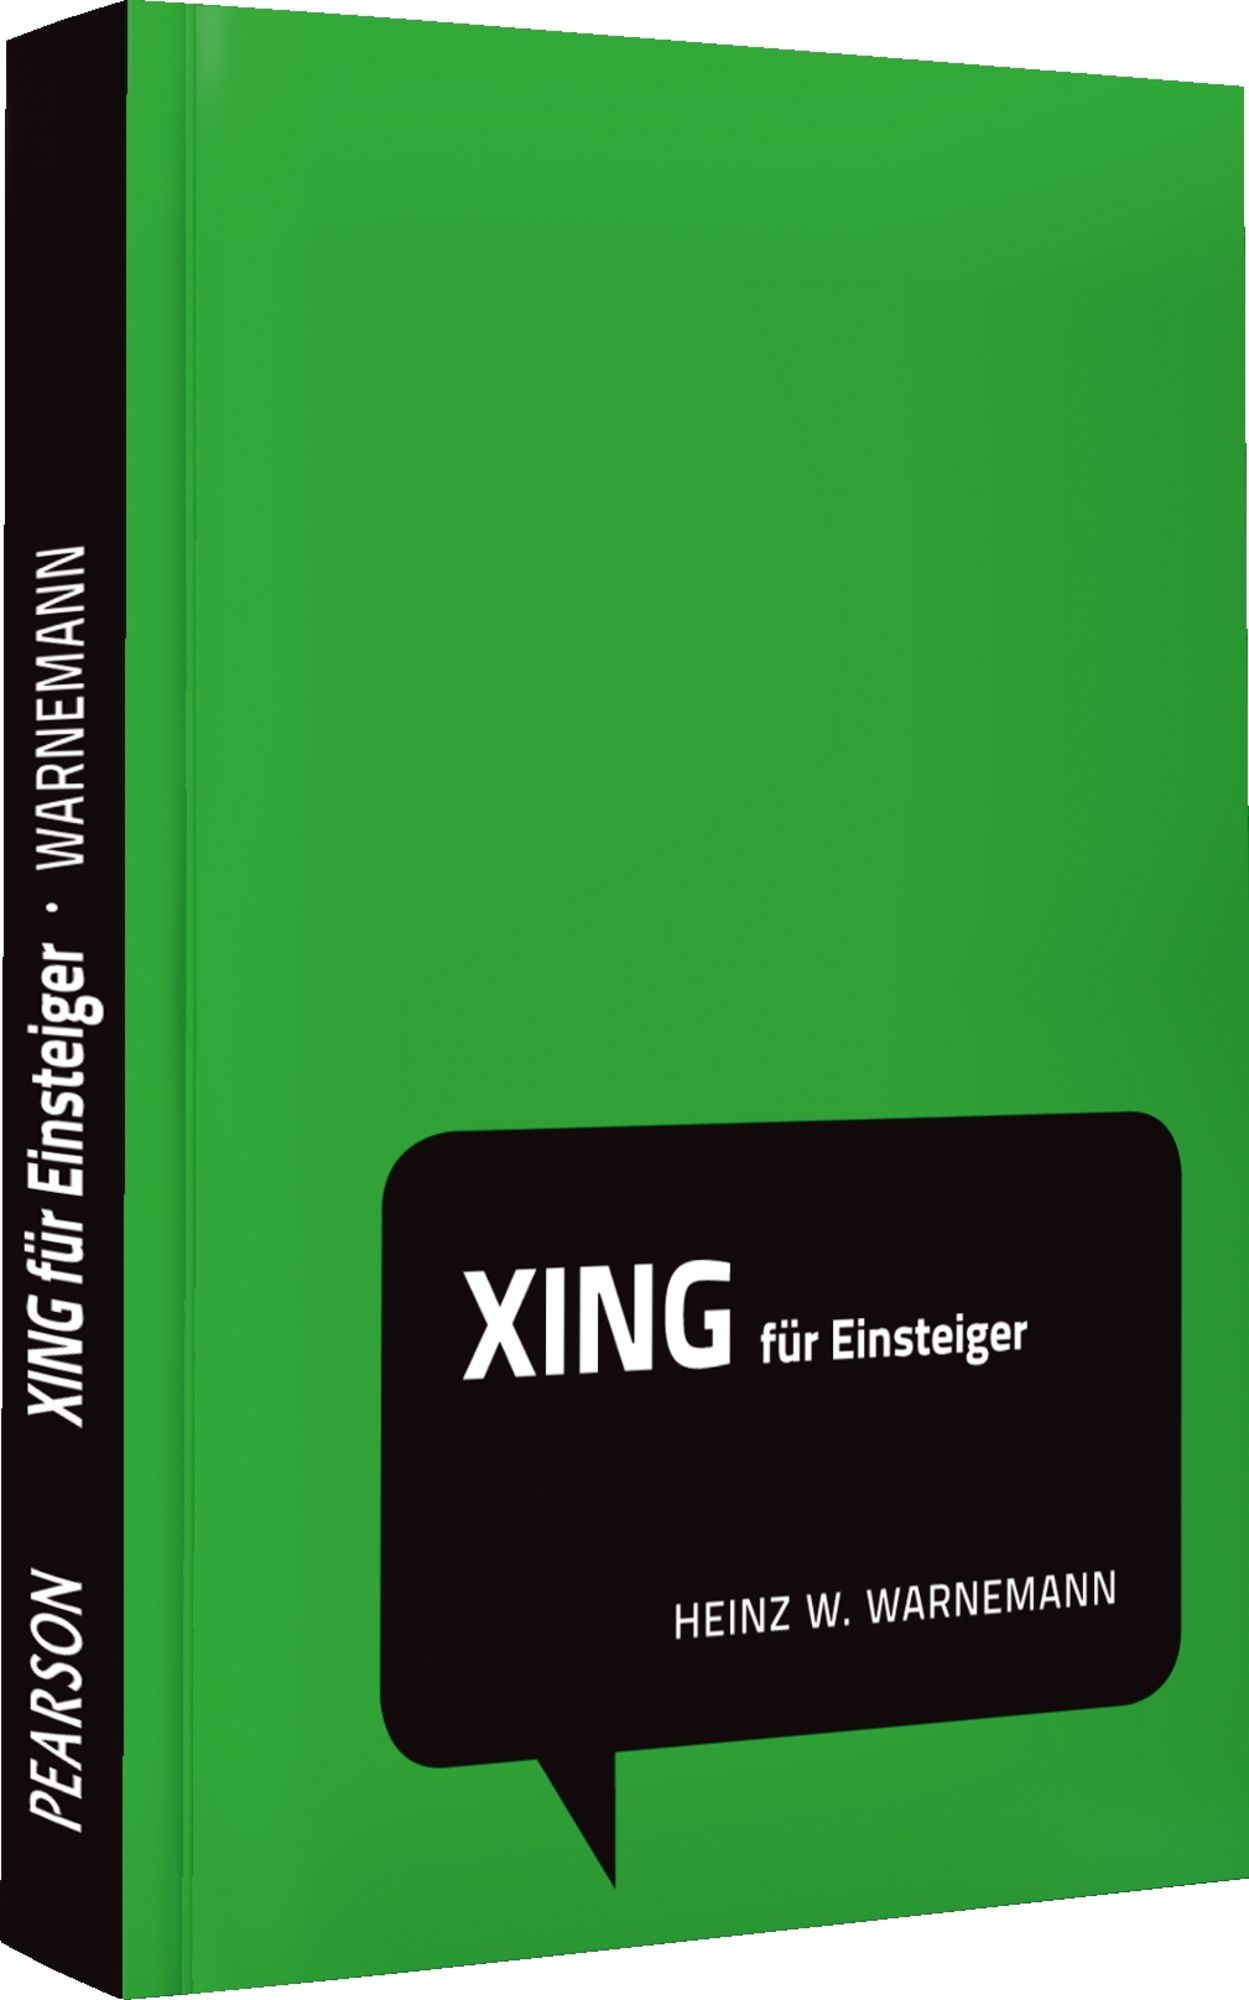 XING für Einsteiger: Social Media Minis (Pearso...